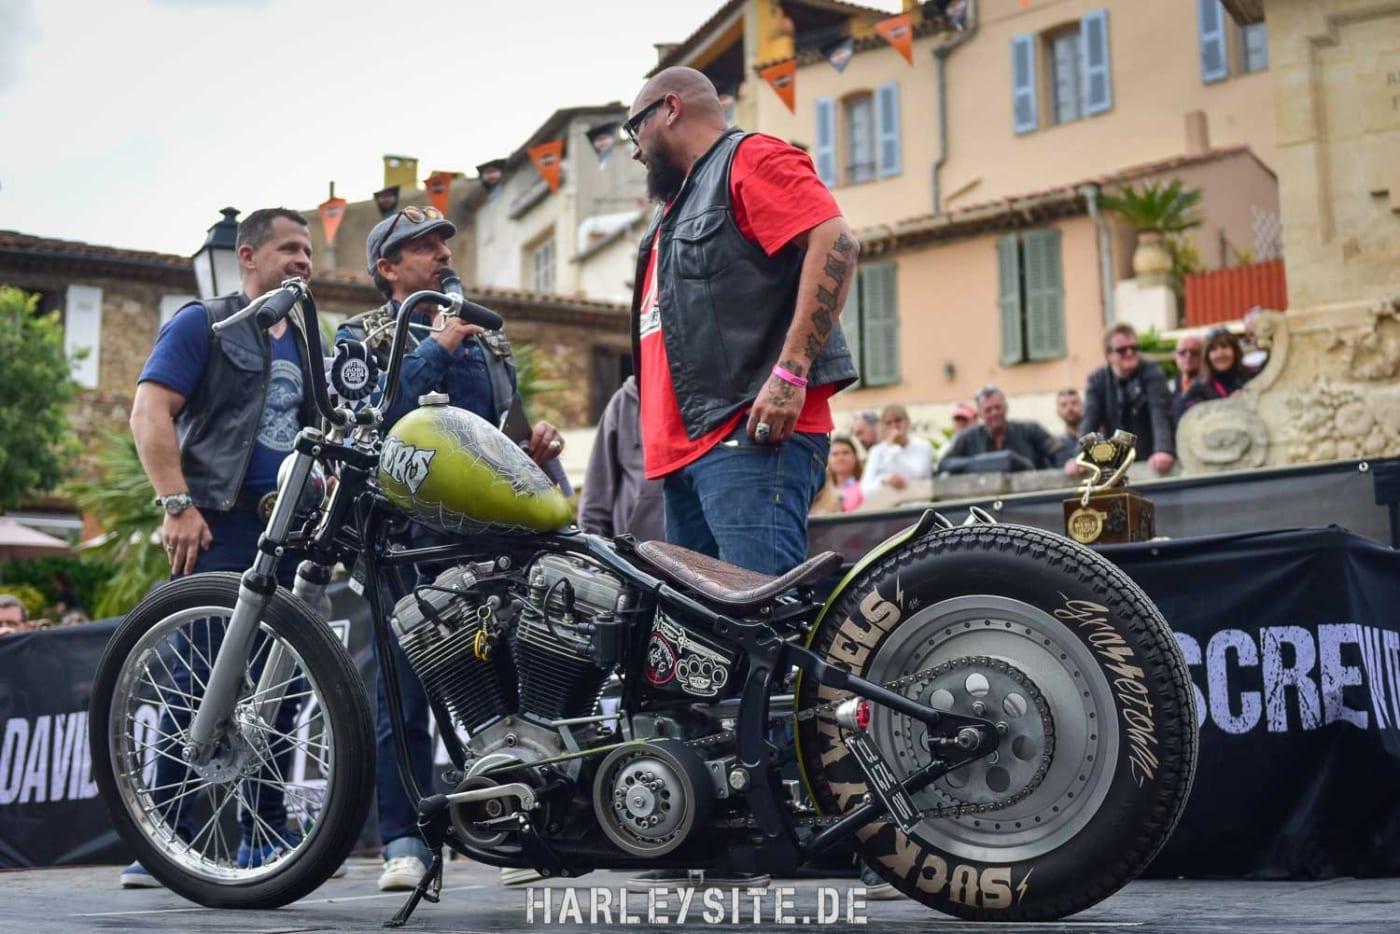 Custombike auf der Euro Festival Bike Show in Grimaud